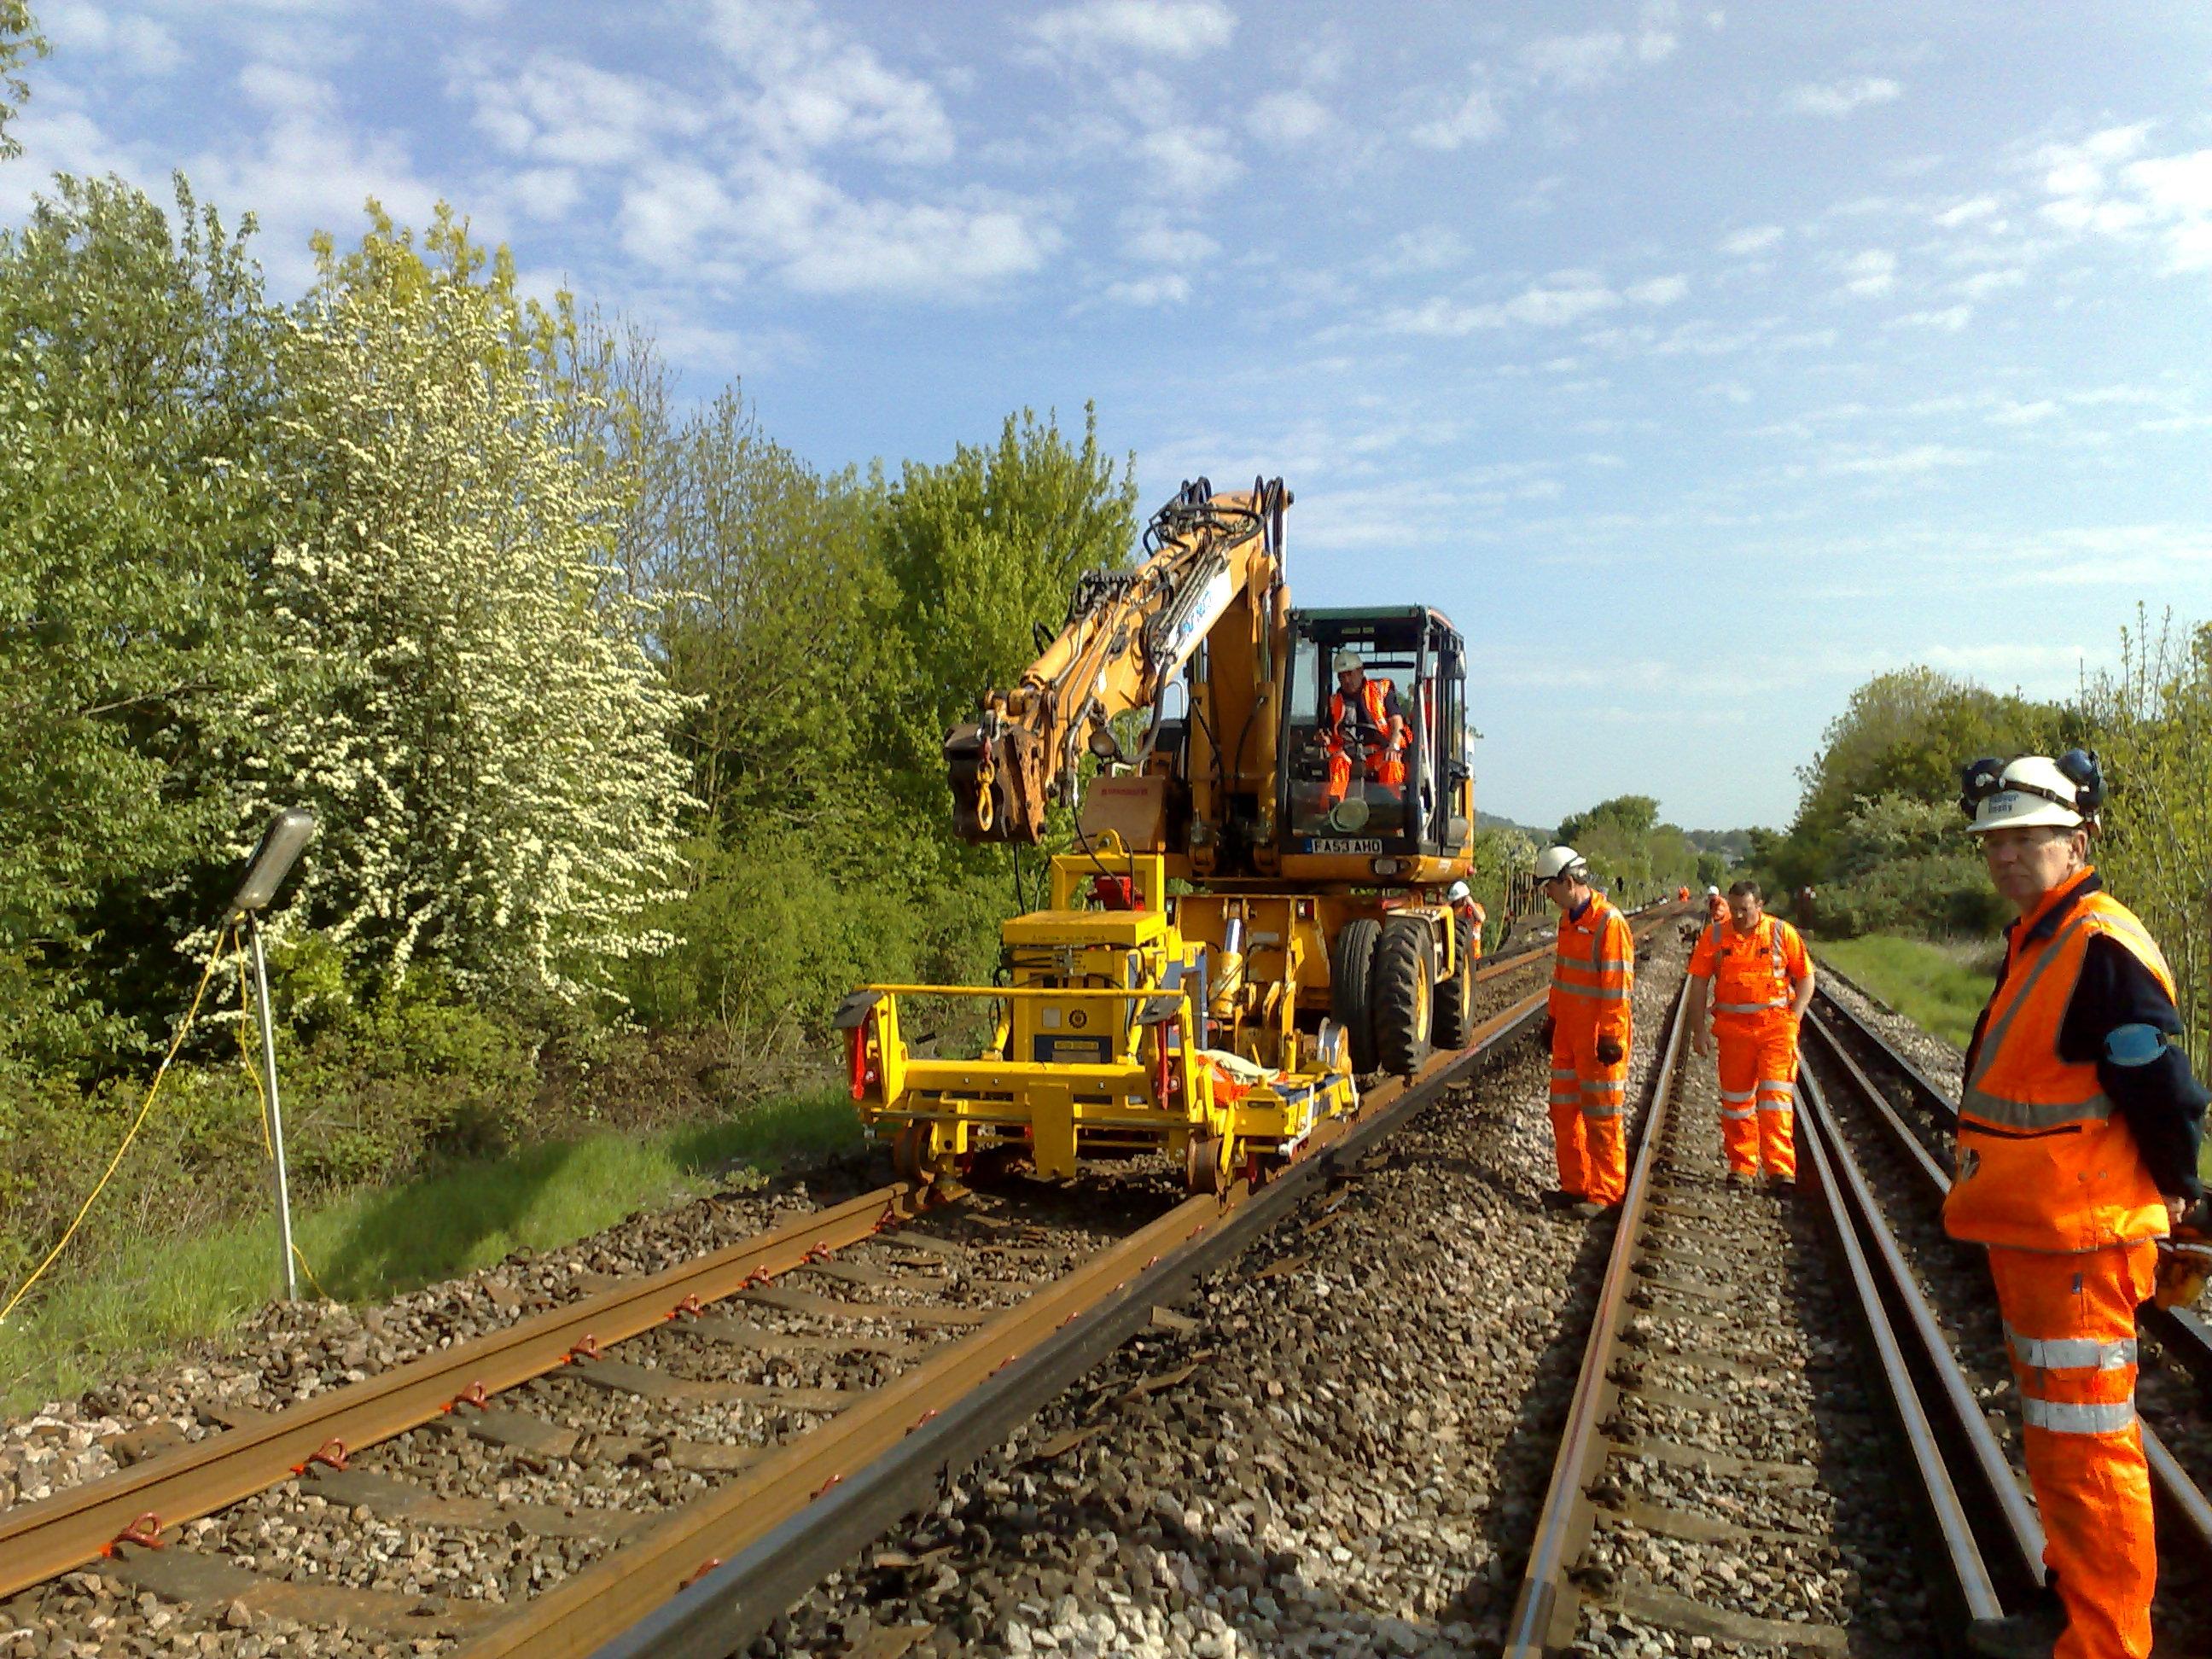 assembling of railway tracks